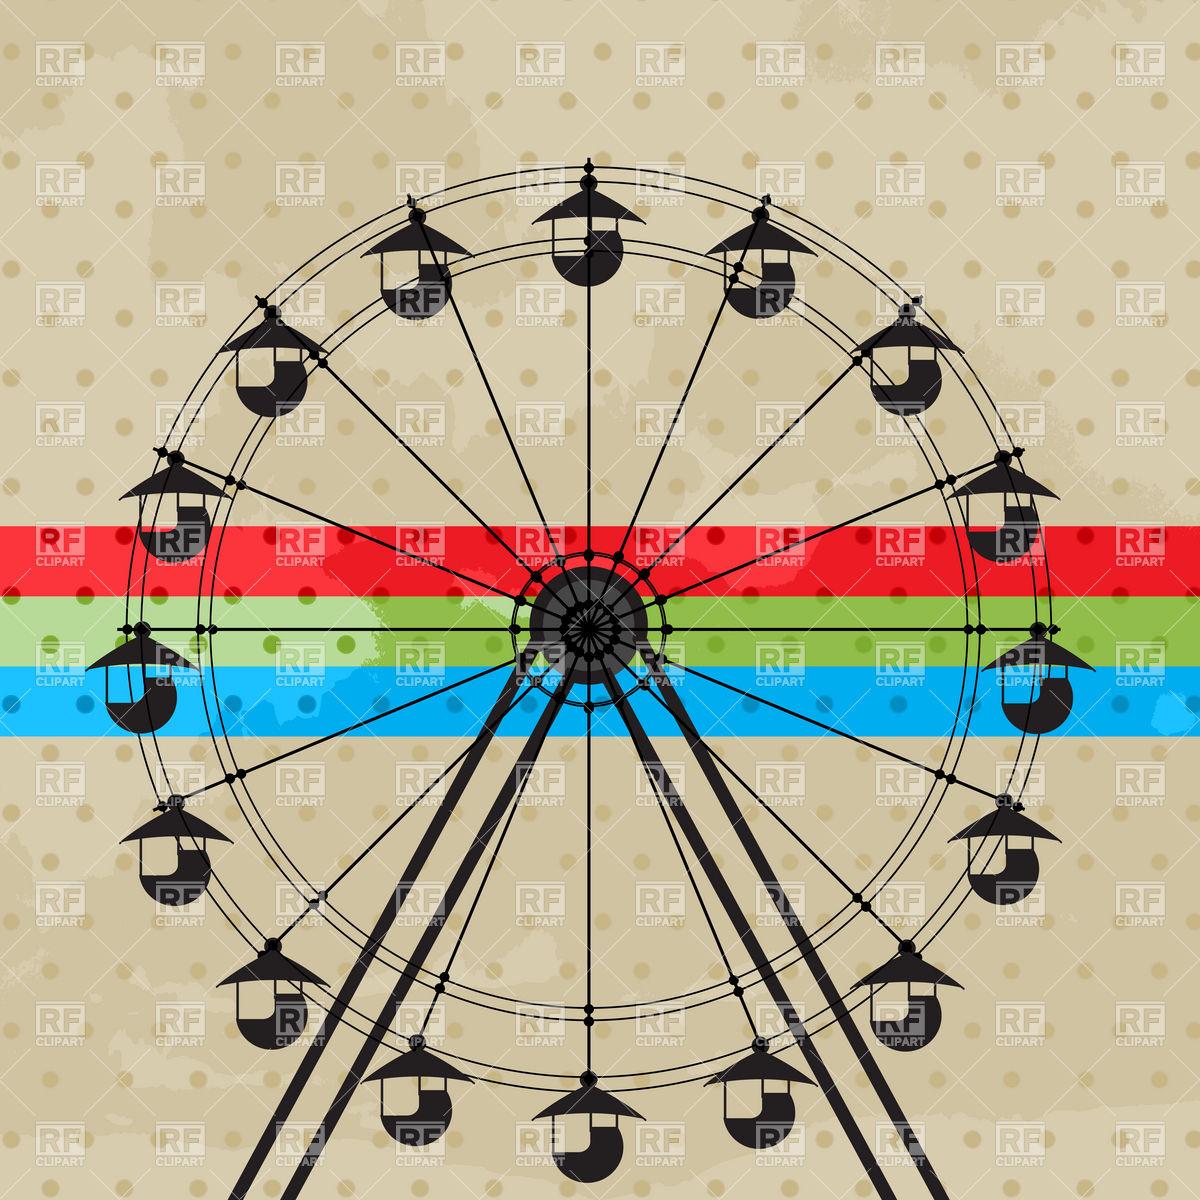 Ferris Wheel clipart fun park Amusement Amusement ferris Amusement Funfair